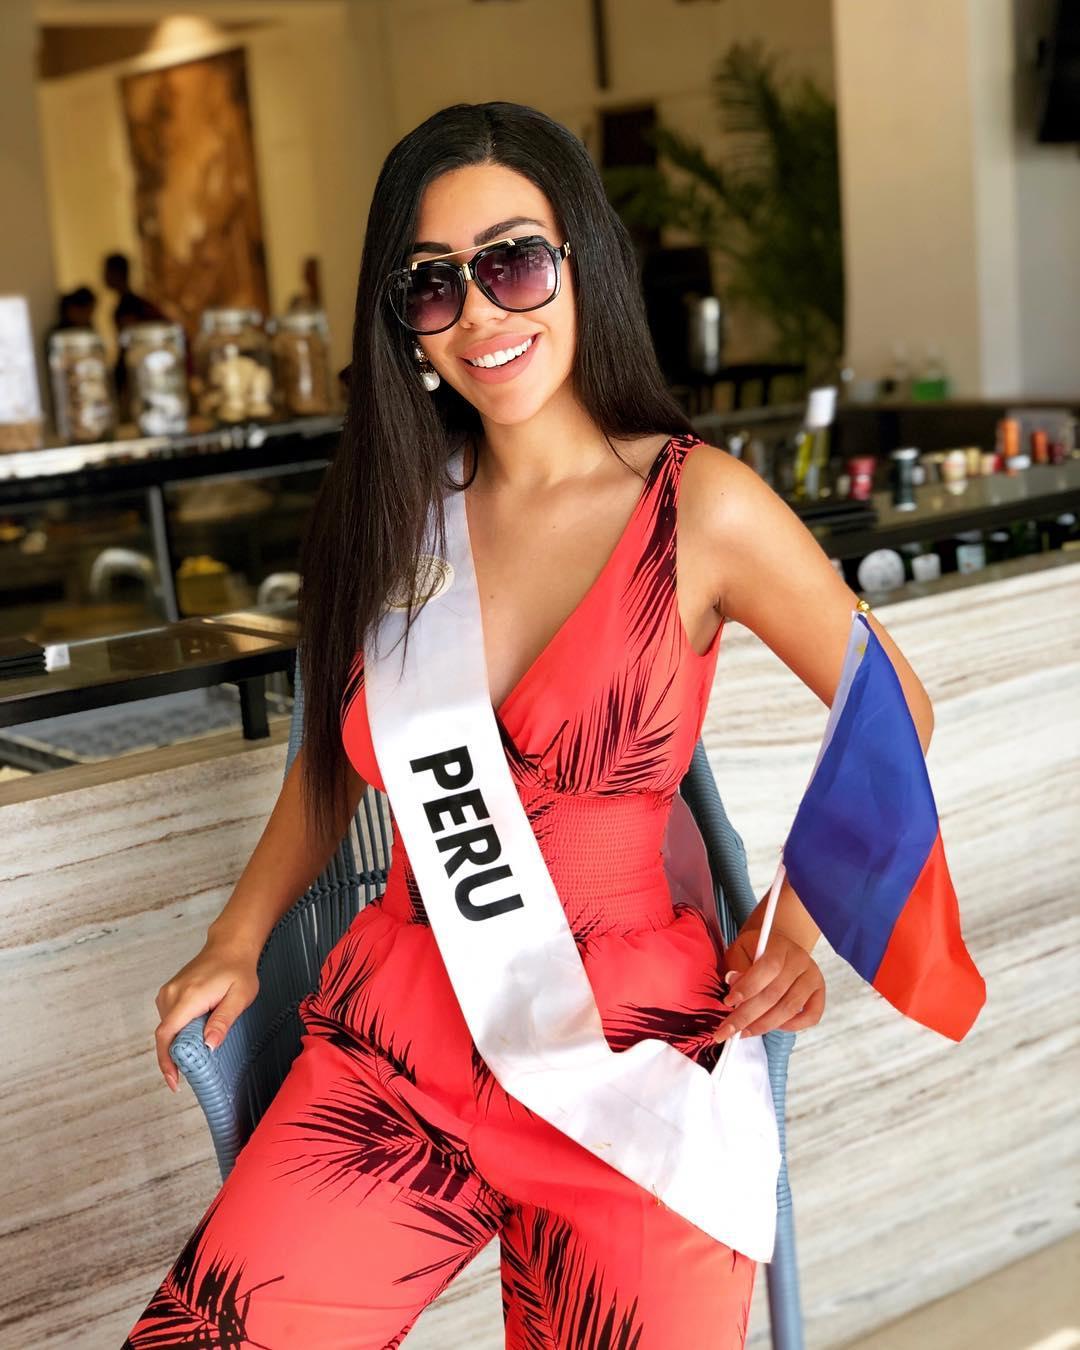 giuliana valenzuela, miss intercontinental peru 2018-2019. - Página 4 49668411